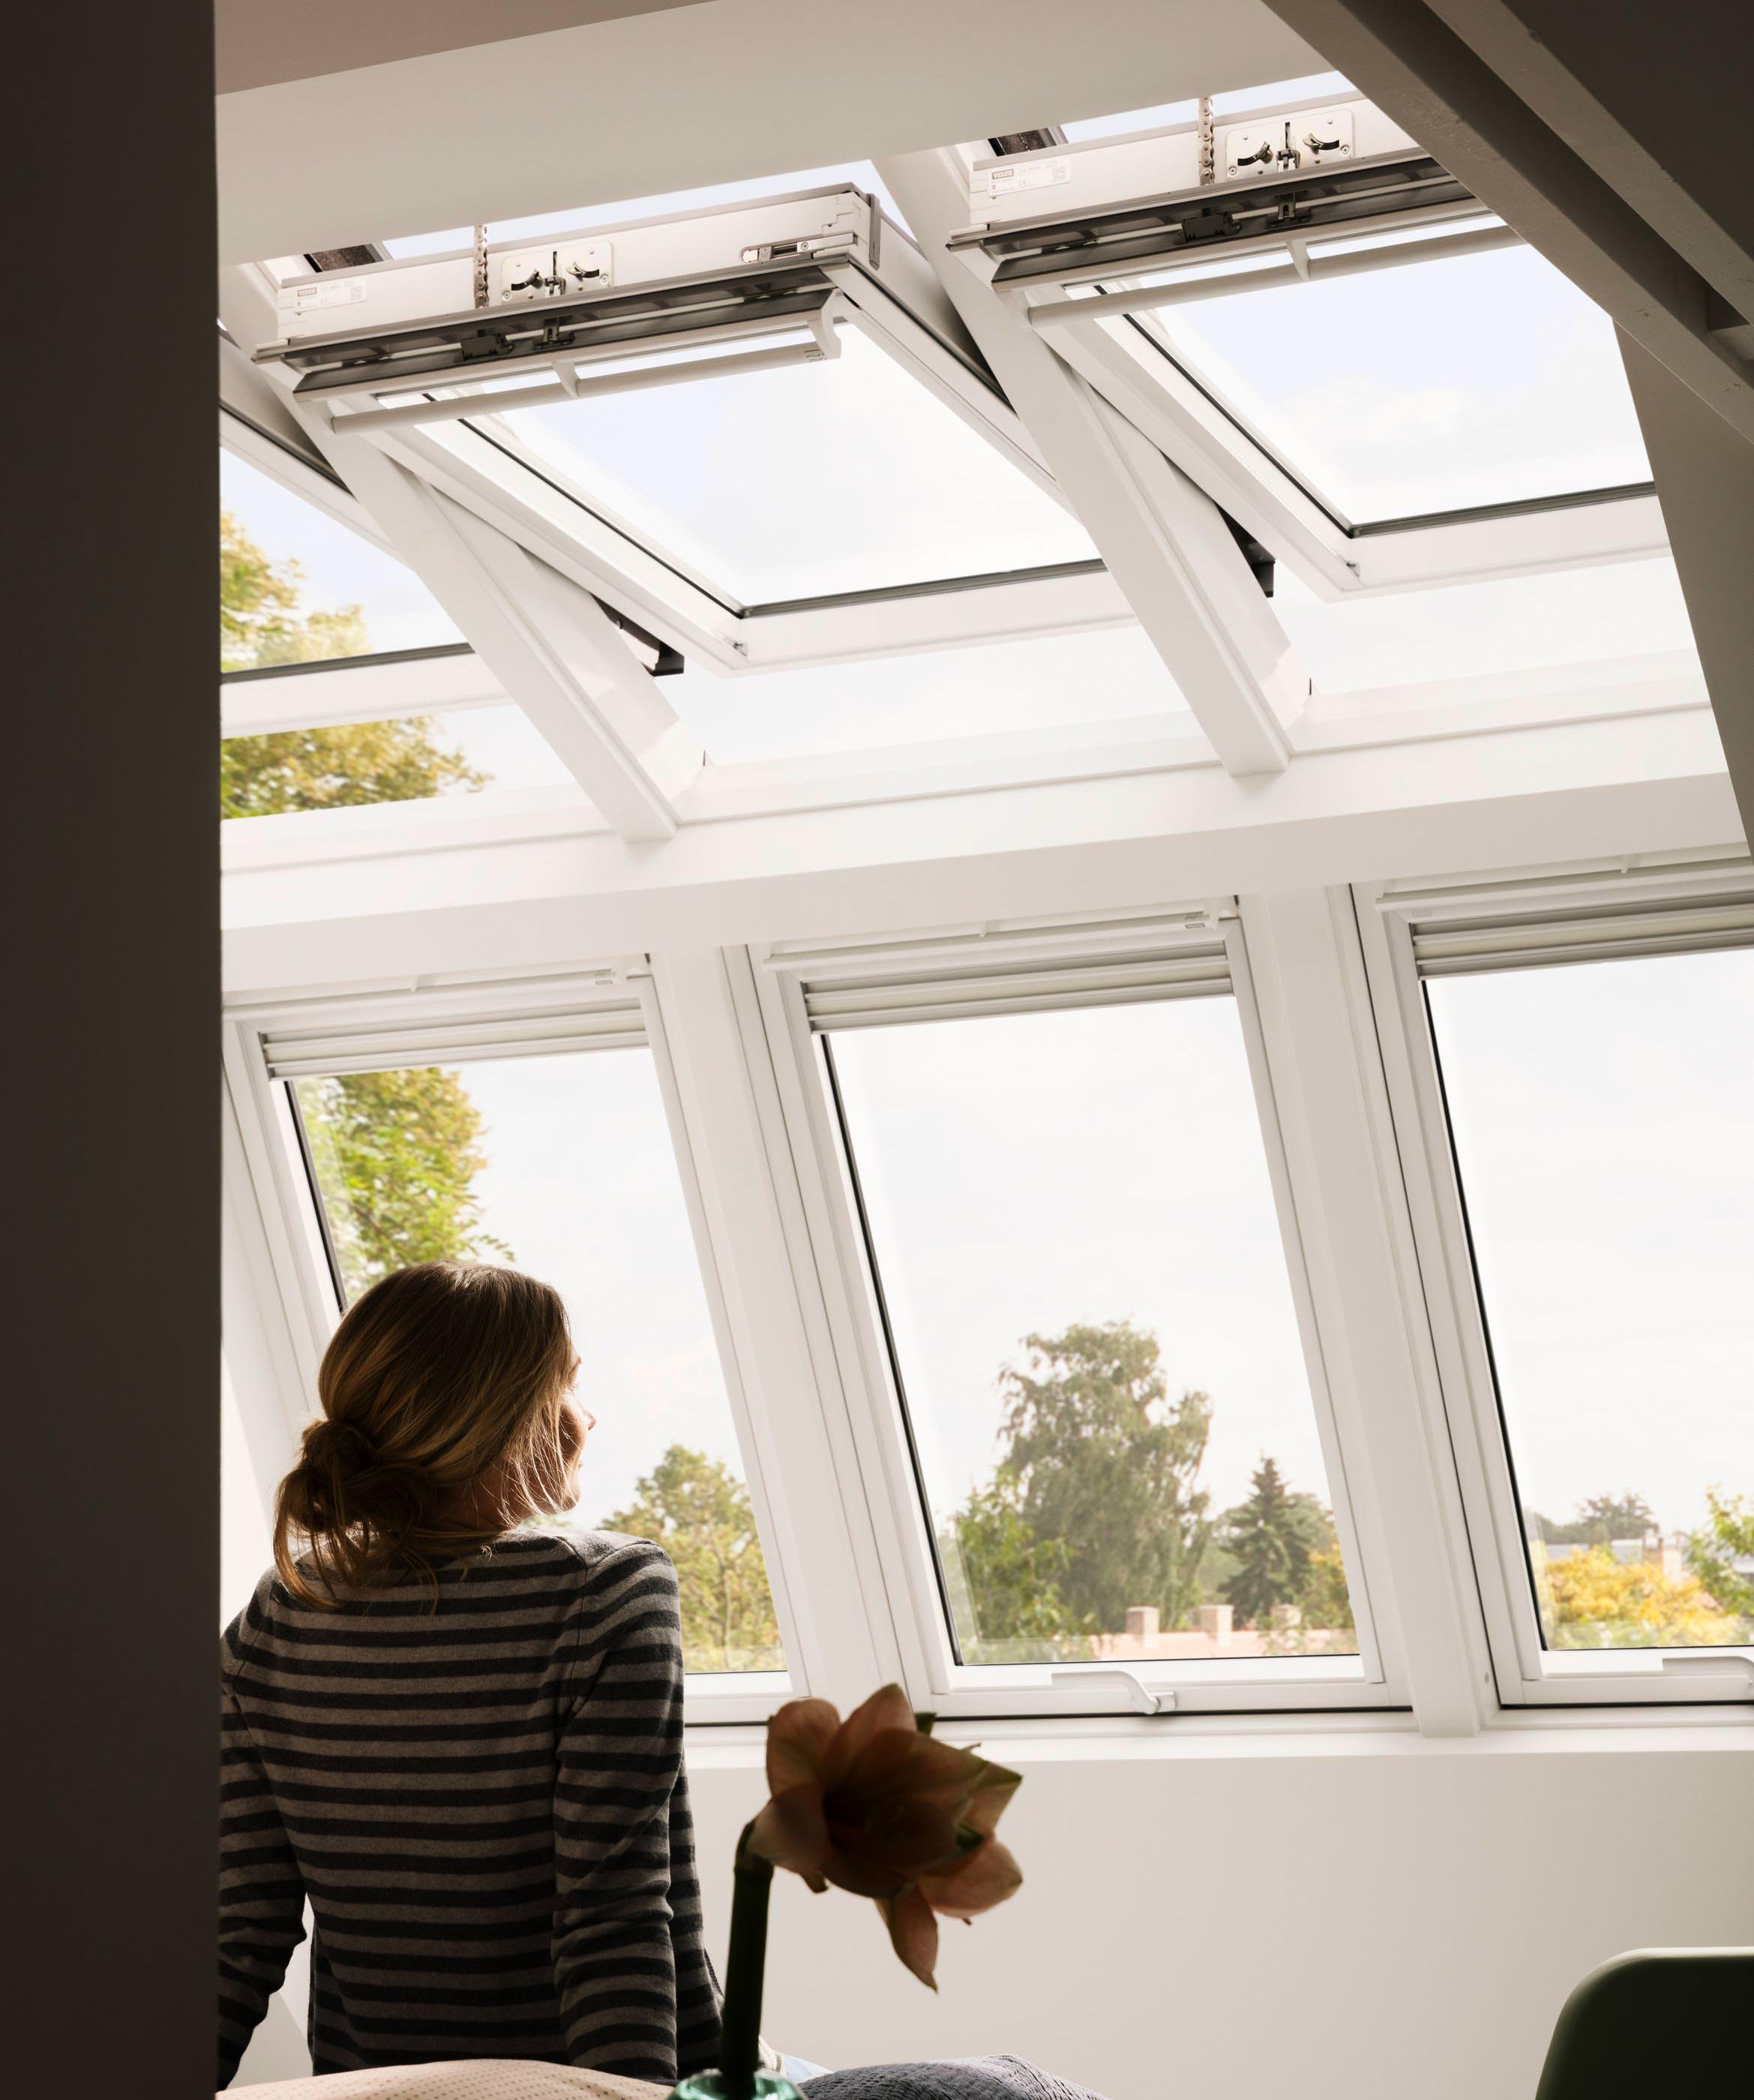 dachfenster 114x118 good dachfenster fakro ftpv u x sk. Black Bedroom Furniture Sets. Home Design Ideas